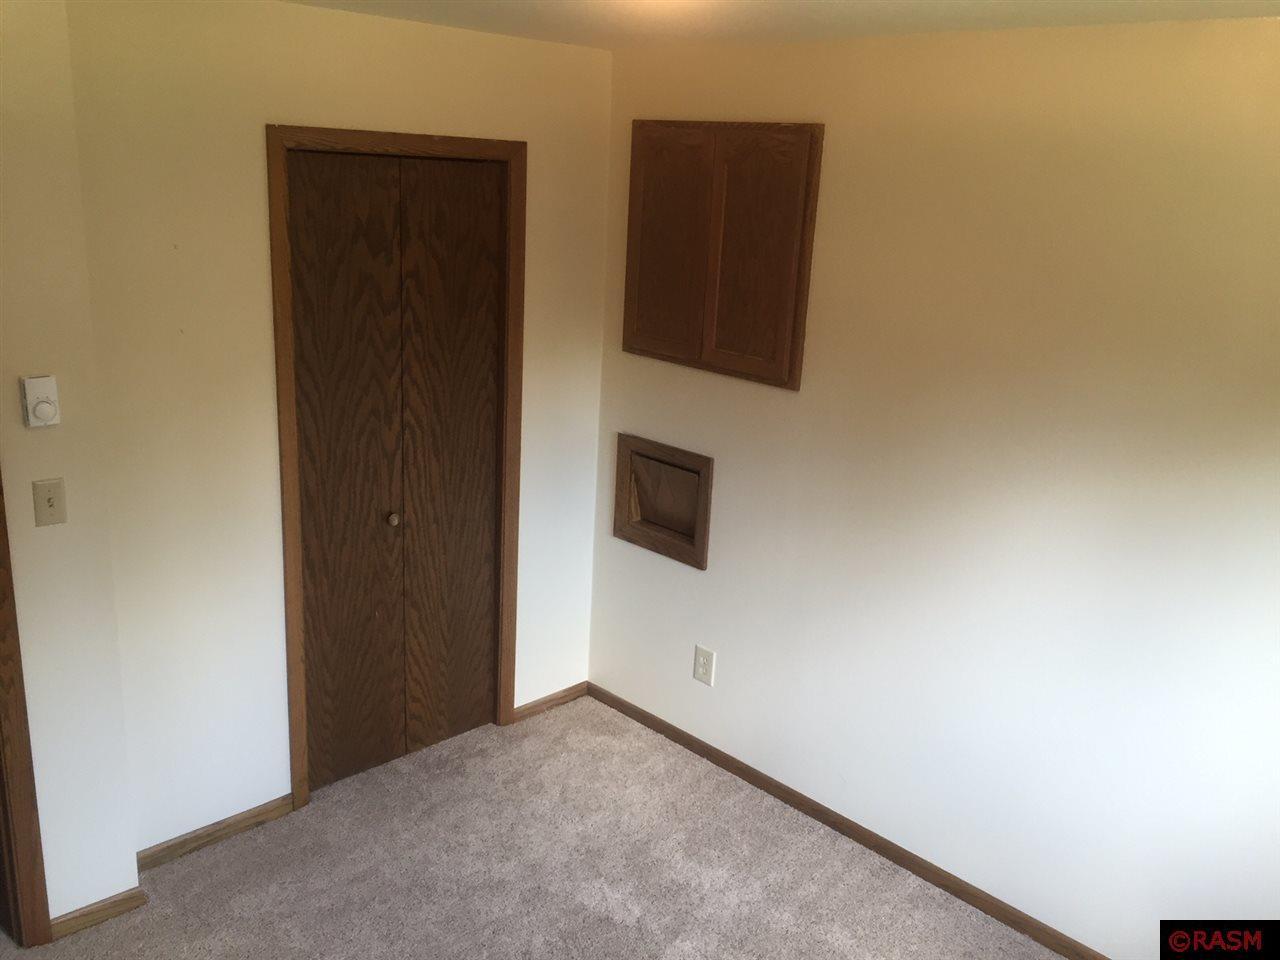 Upper level bedroom, laundry shoot, closet, access to attic.